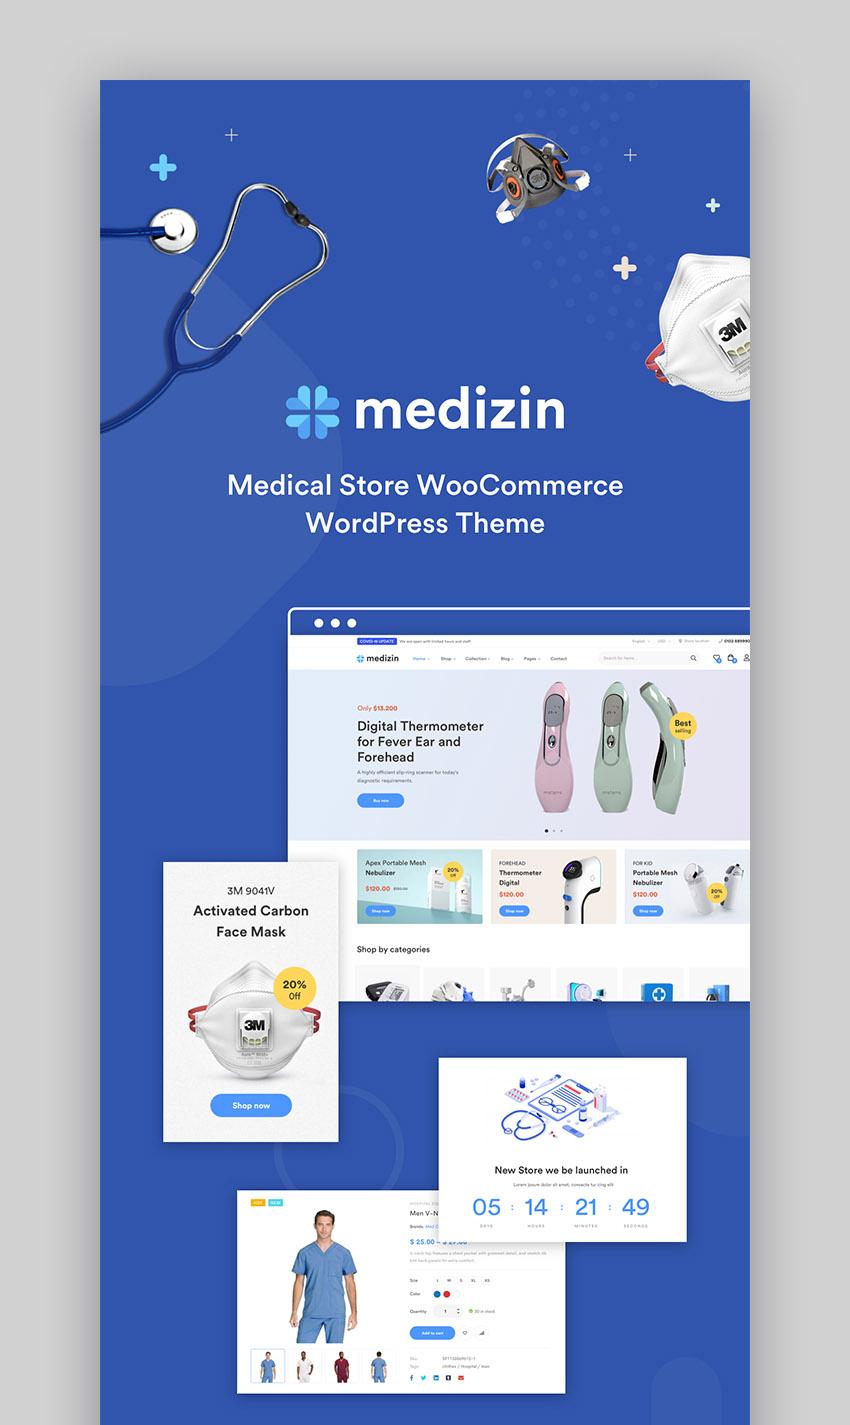 Medizin Medical Cure Health and Medical Wordpress Theme